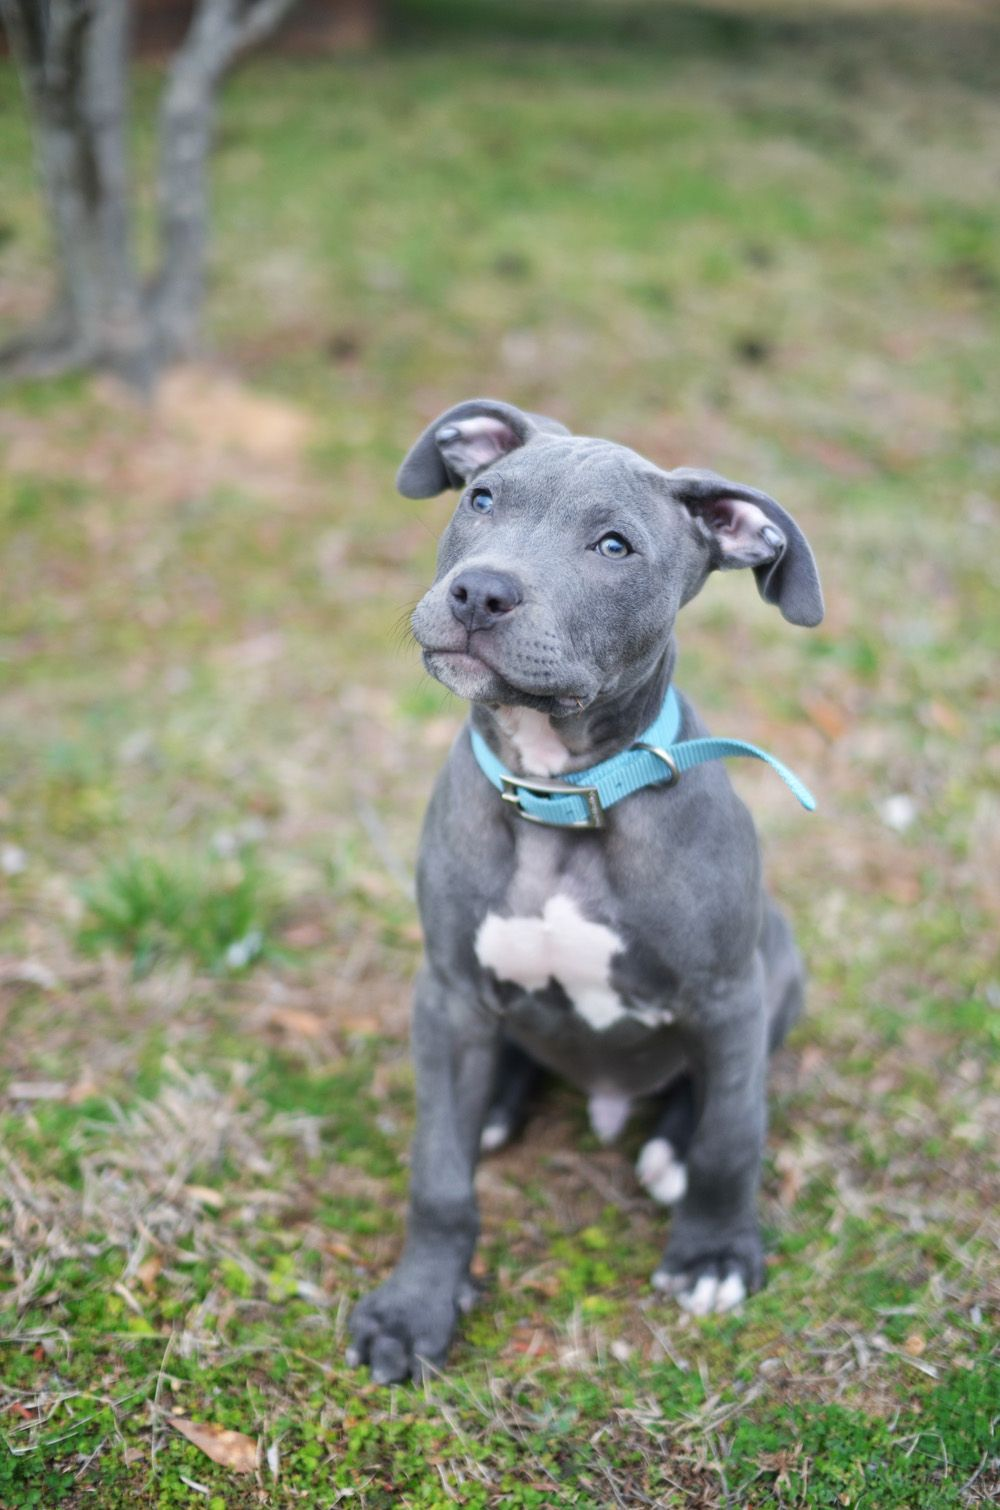 Training A Pup Pitbull Puppies Training Pitbull Terrier Blue Nose Pitbull Puppies